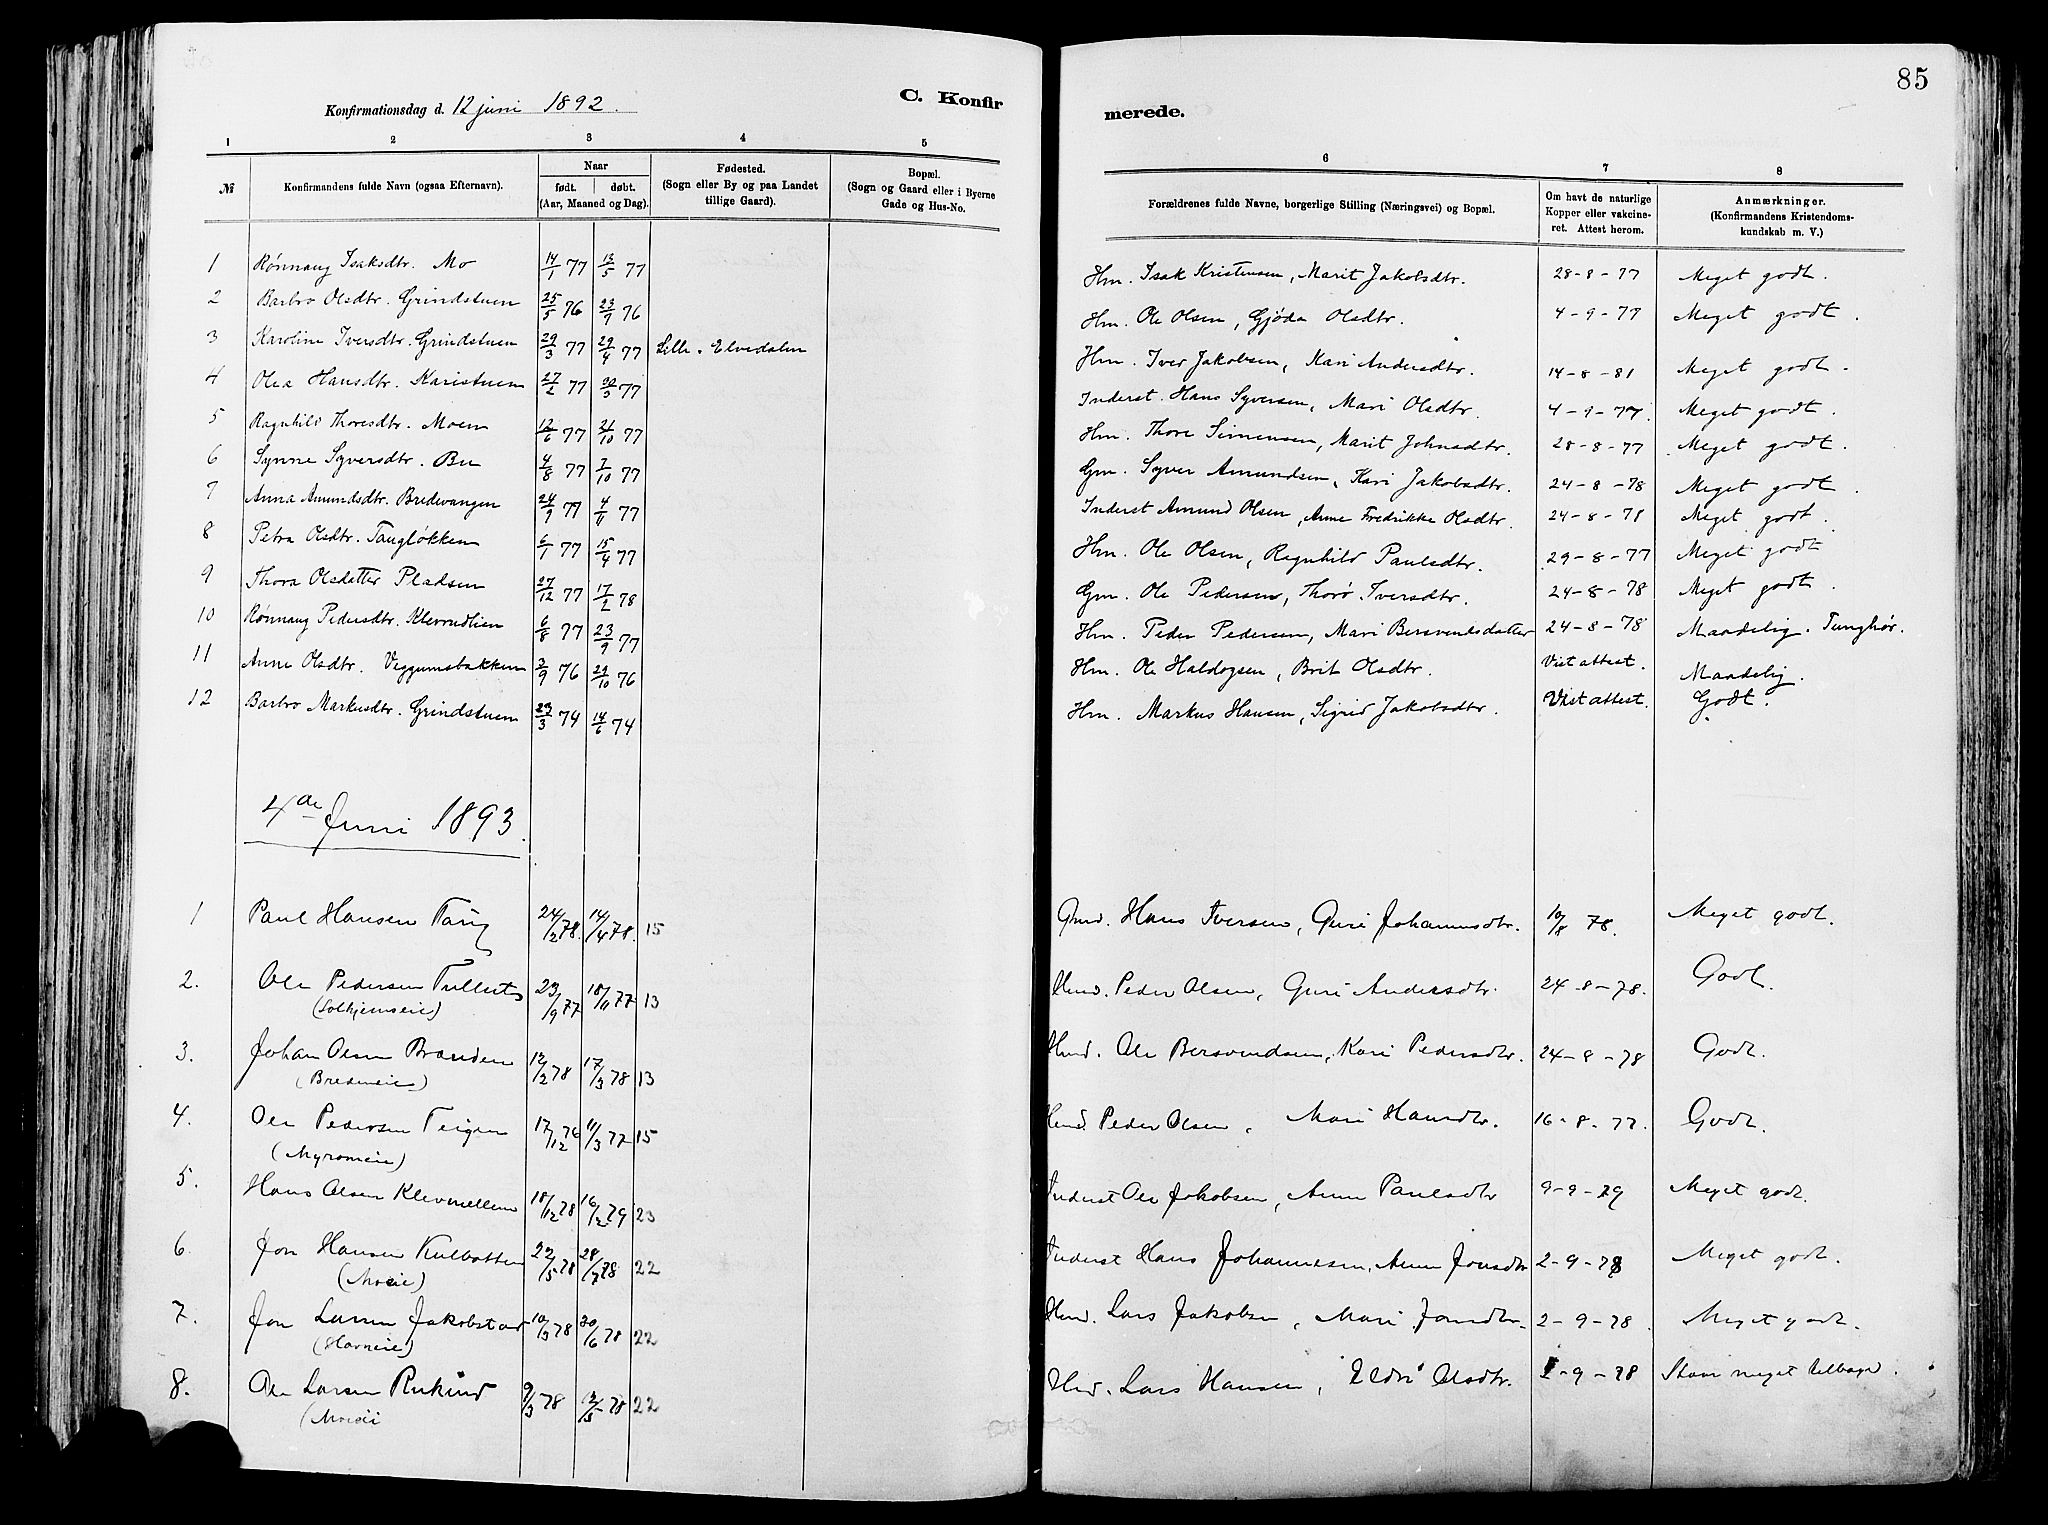 SAH, Vågå prestekontor, Ministerialbok nr. 8, 1886-1904, s. 85